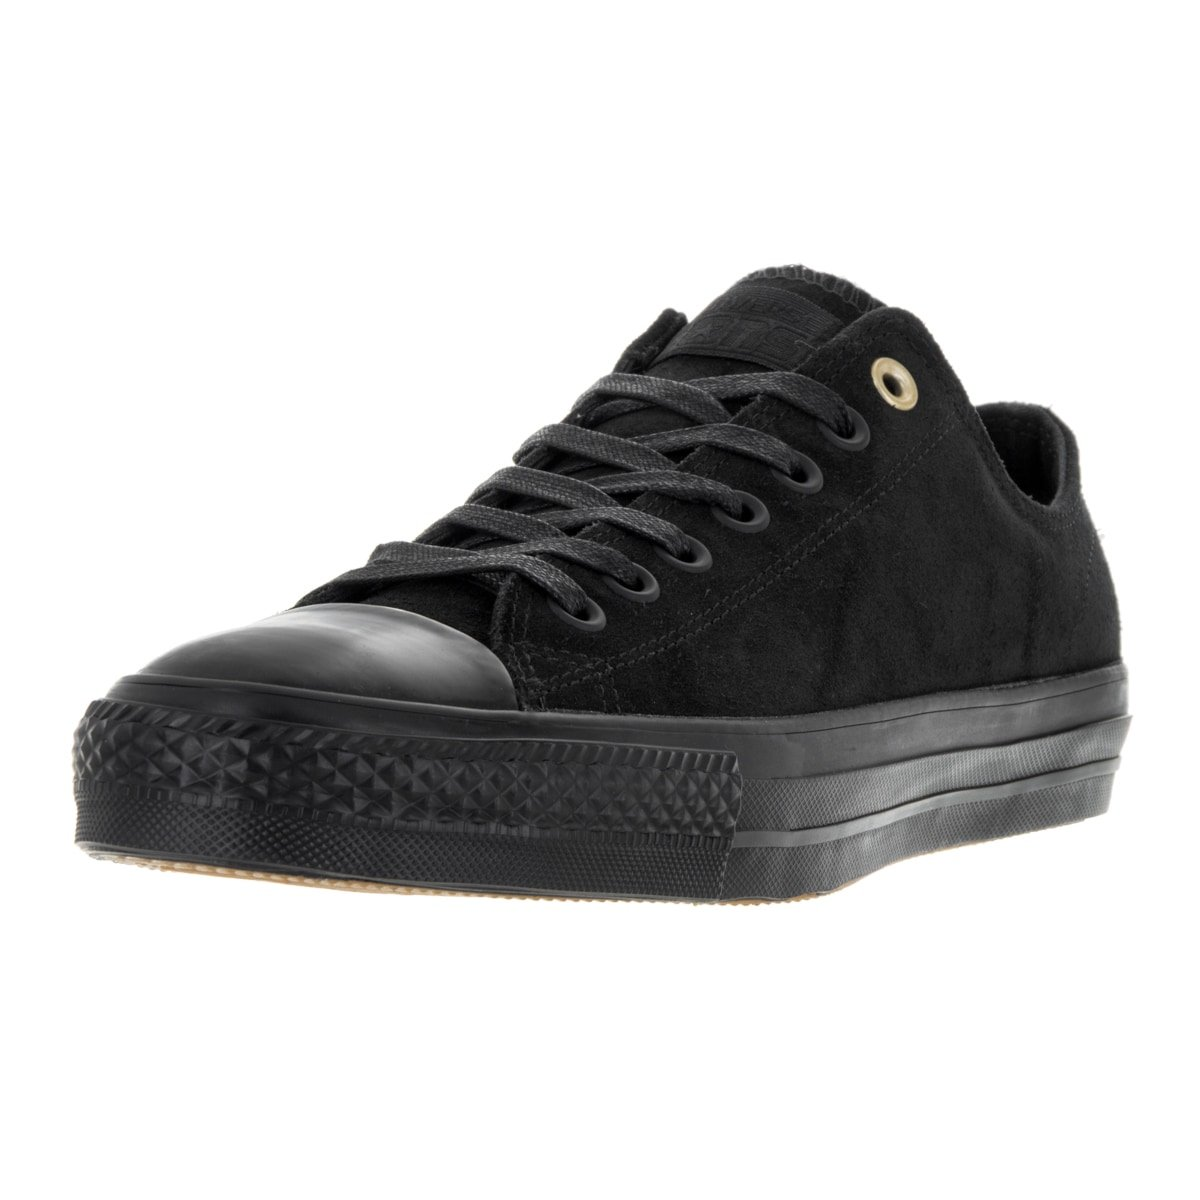 Converse Unisex One Star Pro Ox Black/Black/Storm Wind Skate Shoe 12 by Converse